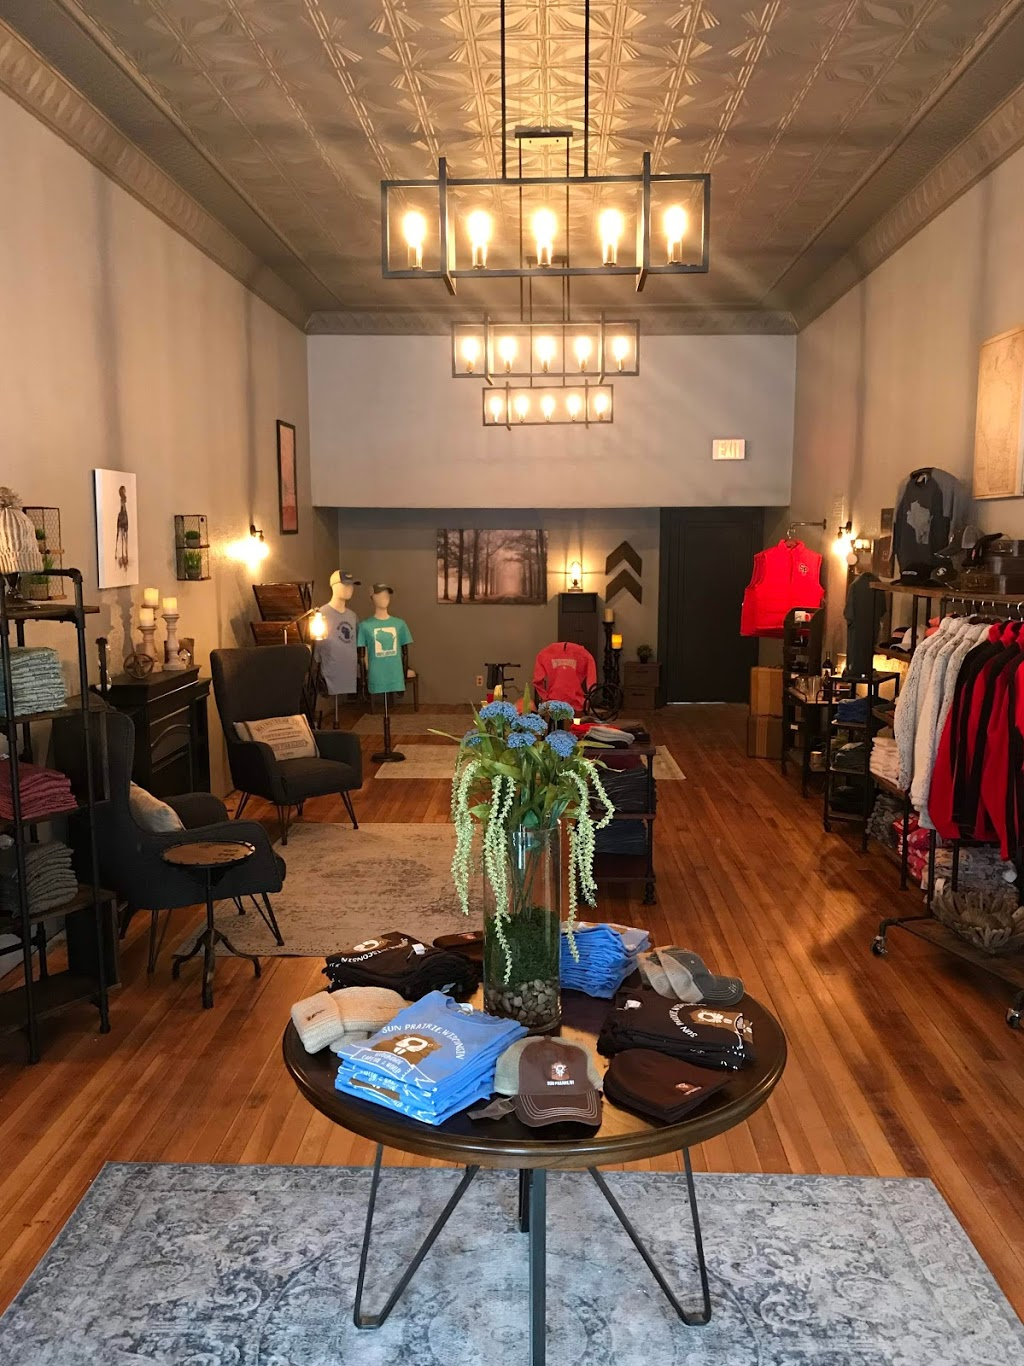 Wisconsin Apparel Co. - clothing store  | Photo 7 of 10 | Address: 229 E Main St, Sun Prairie, WI 53590, USA | Phone: (608) 770-1819